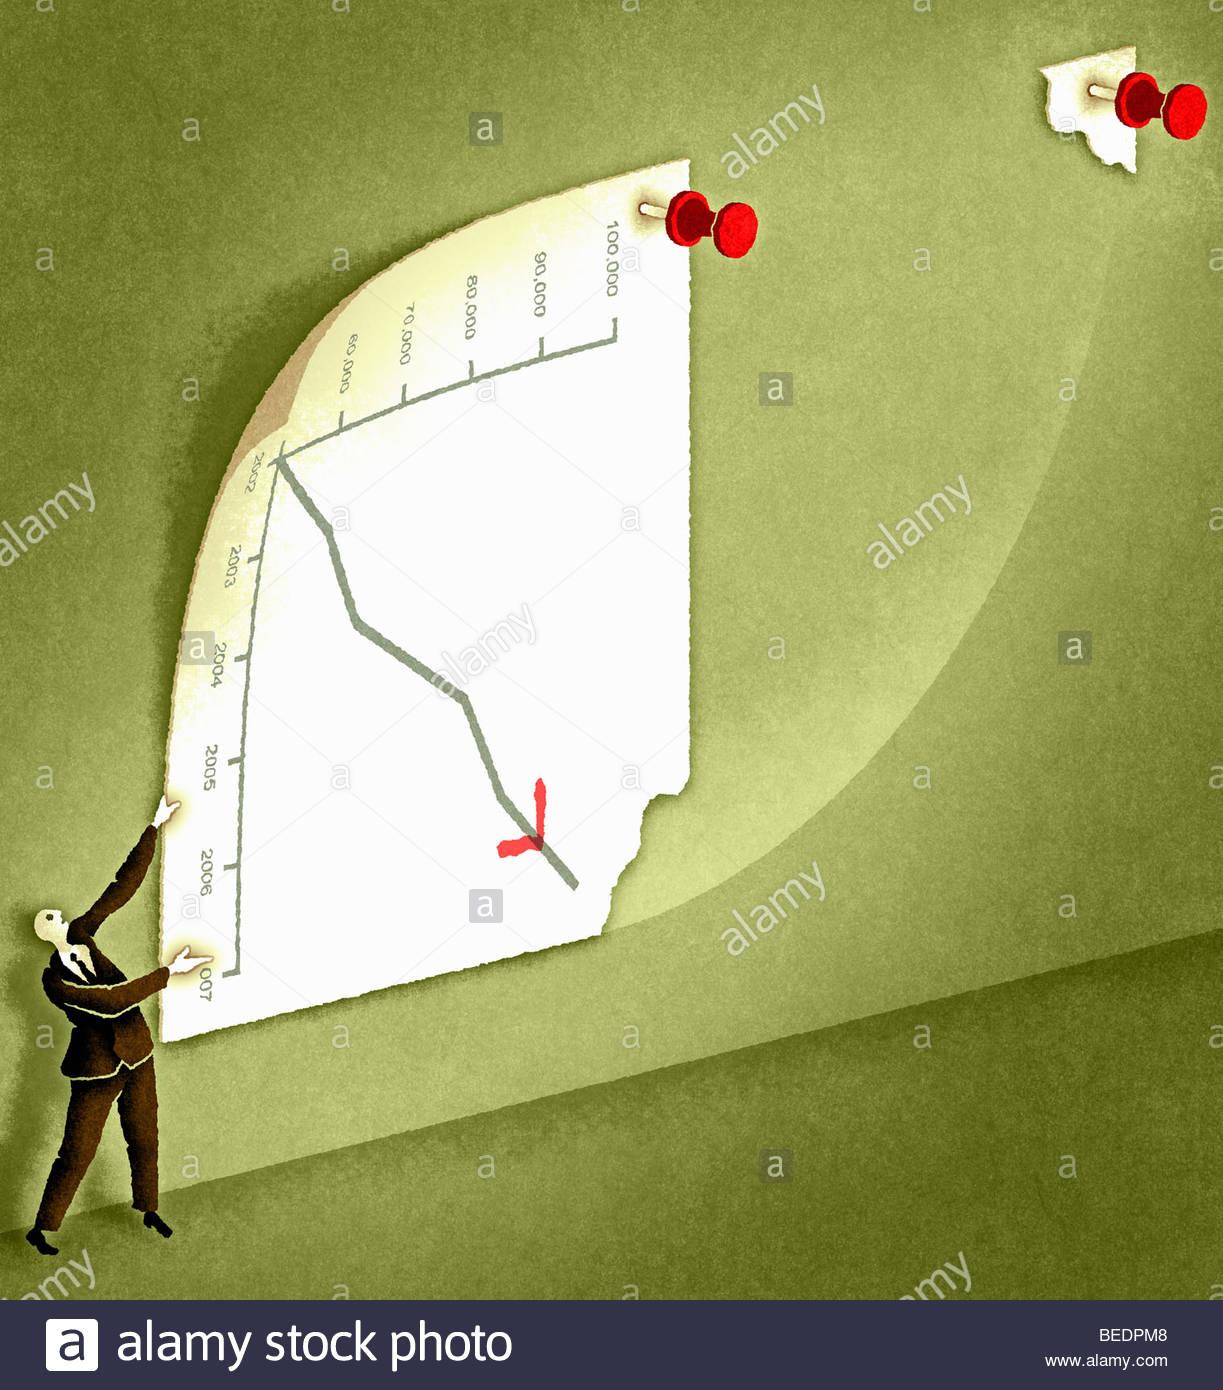 Businessman turning graph to change analysis - Stock Image